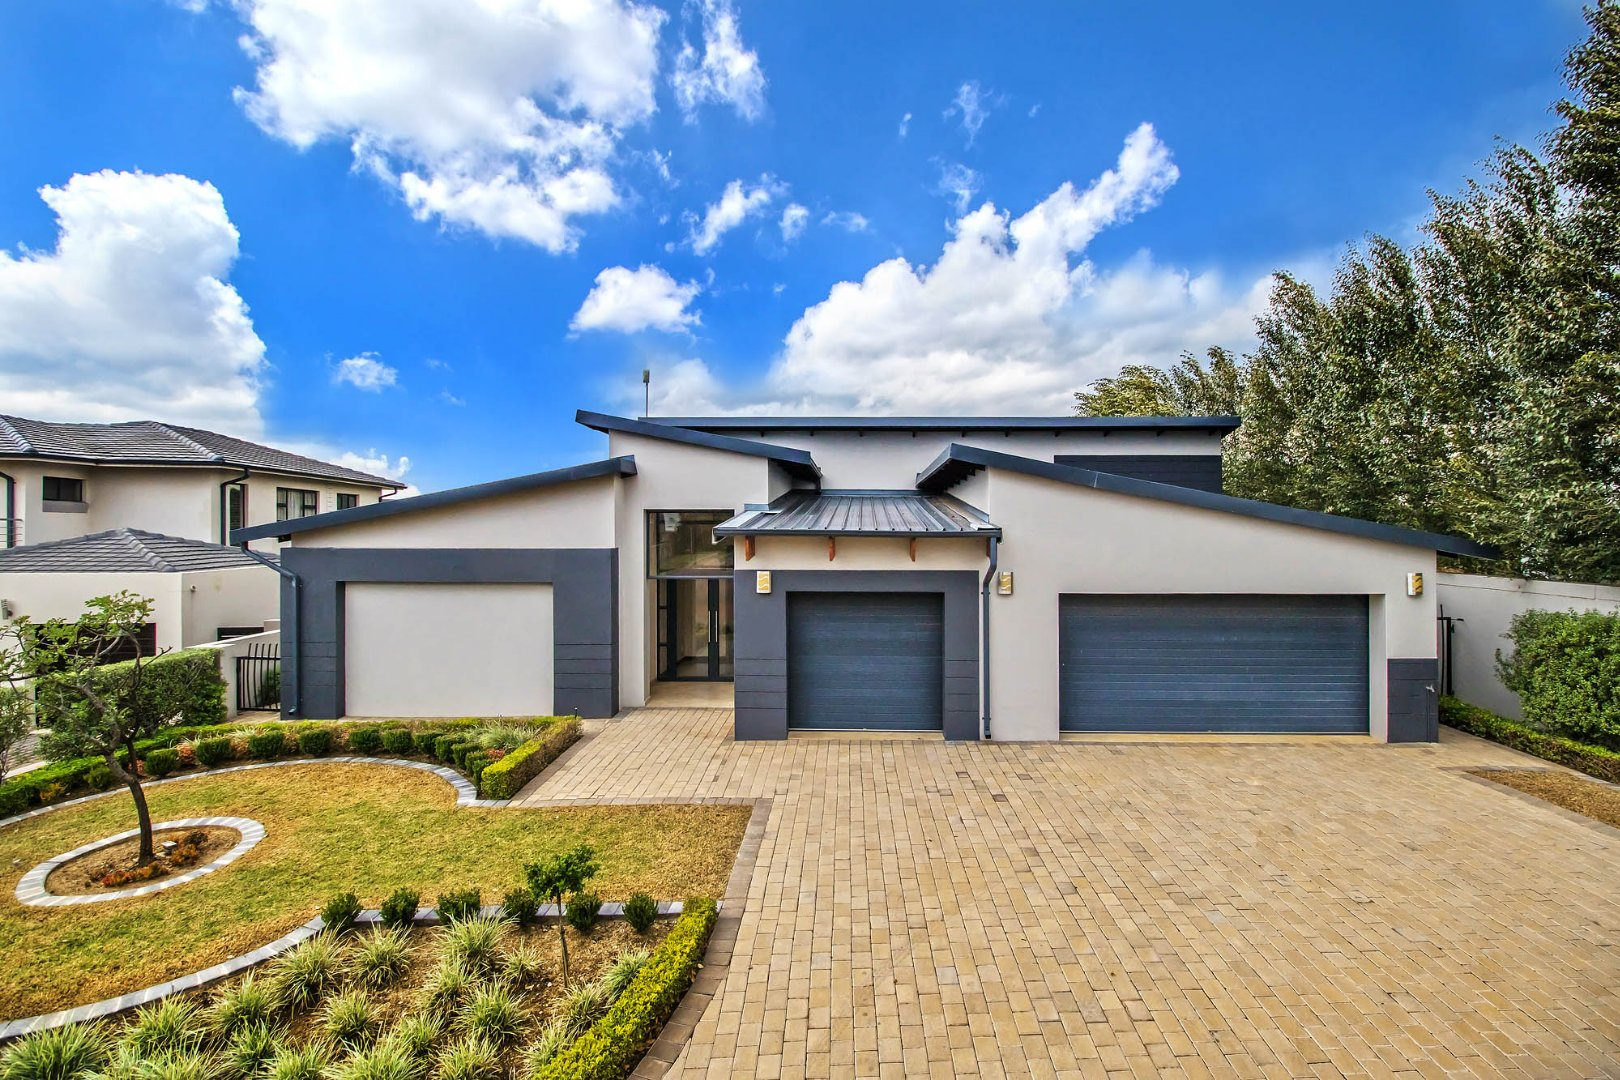 , House, 4 Bedrooms - ZAR 3,100,000